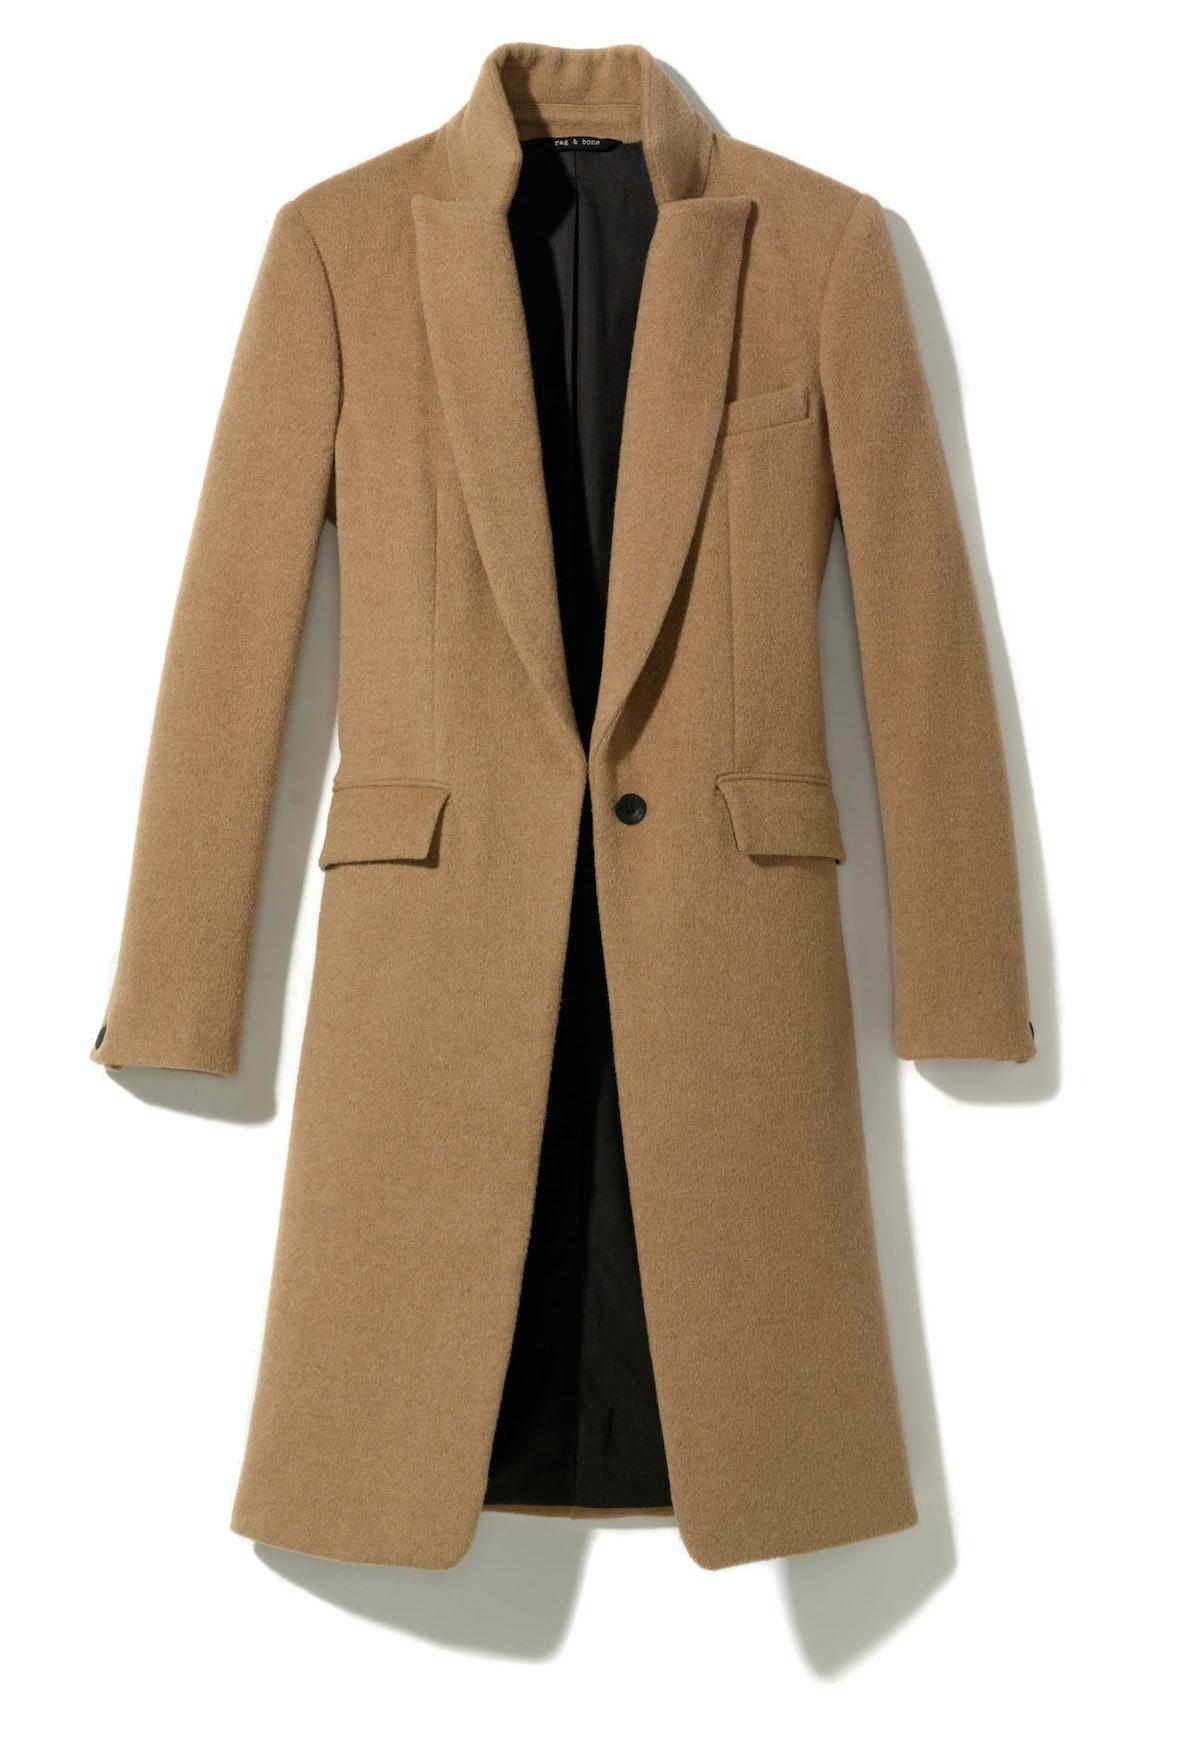 Rag & Bone coat, $1,095, [saks.com](http://rstyle.me/n/dssq53w3n).